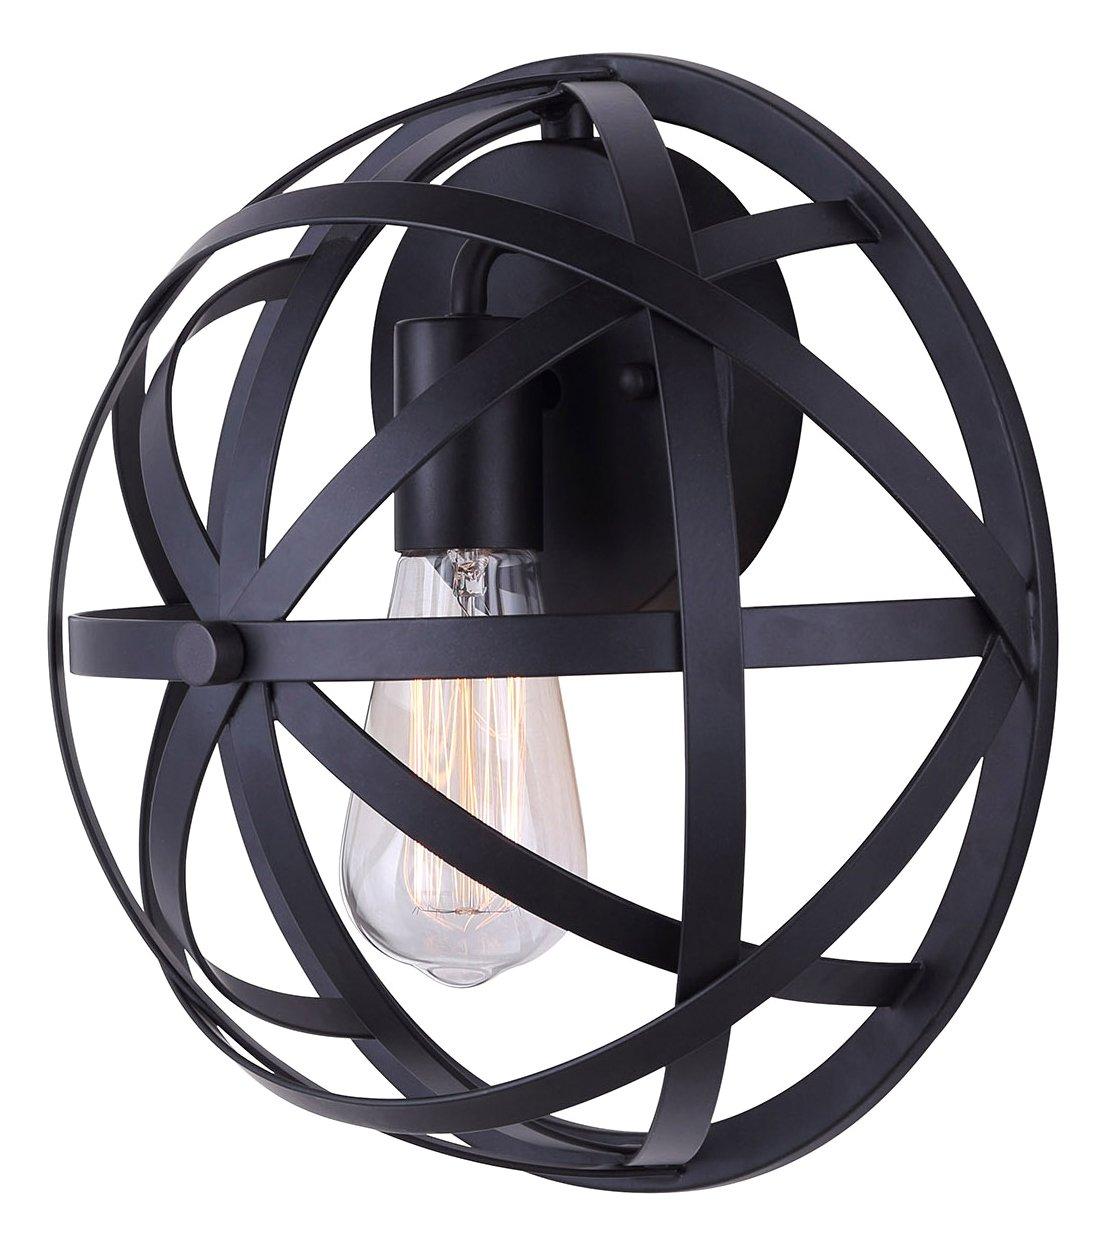 (1 light) - CANARM IWL567A12BK-C Gigi 1 Light Wall Light Black with Metal Cage, Oil Rubbed Bronze B01A93TVTI 1 light|オイルステイン仕上げブロンズ オイルステイン仕上げブロンズ 1 light